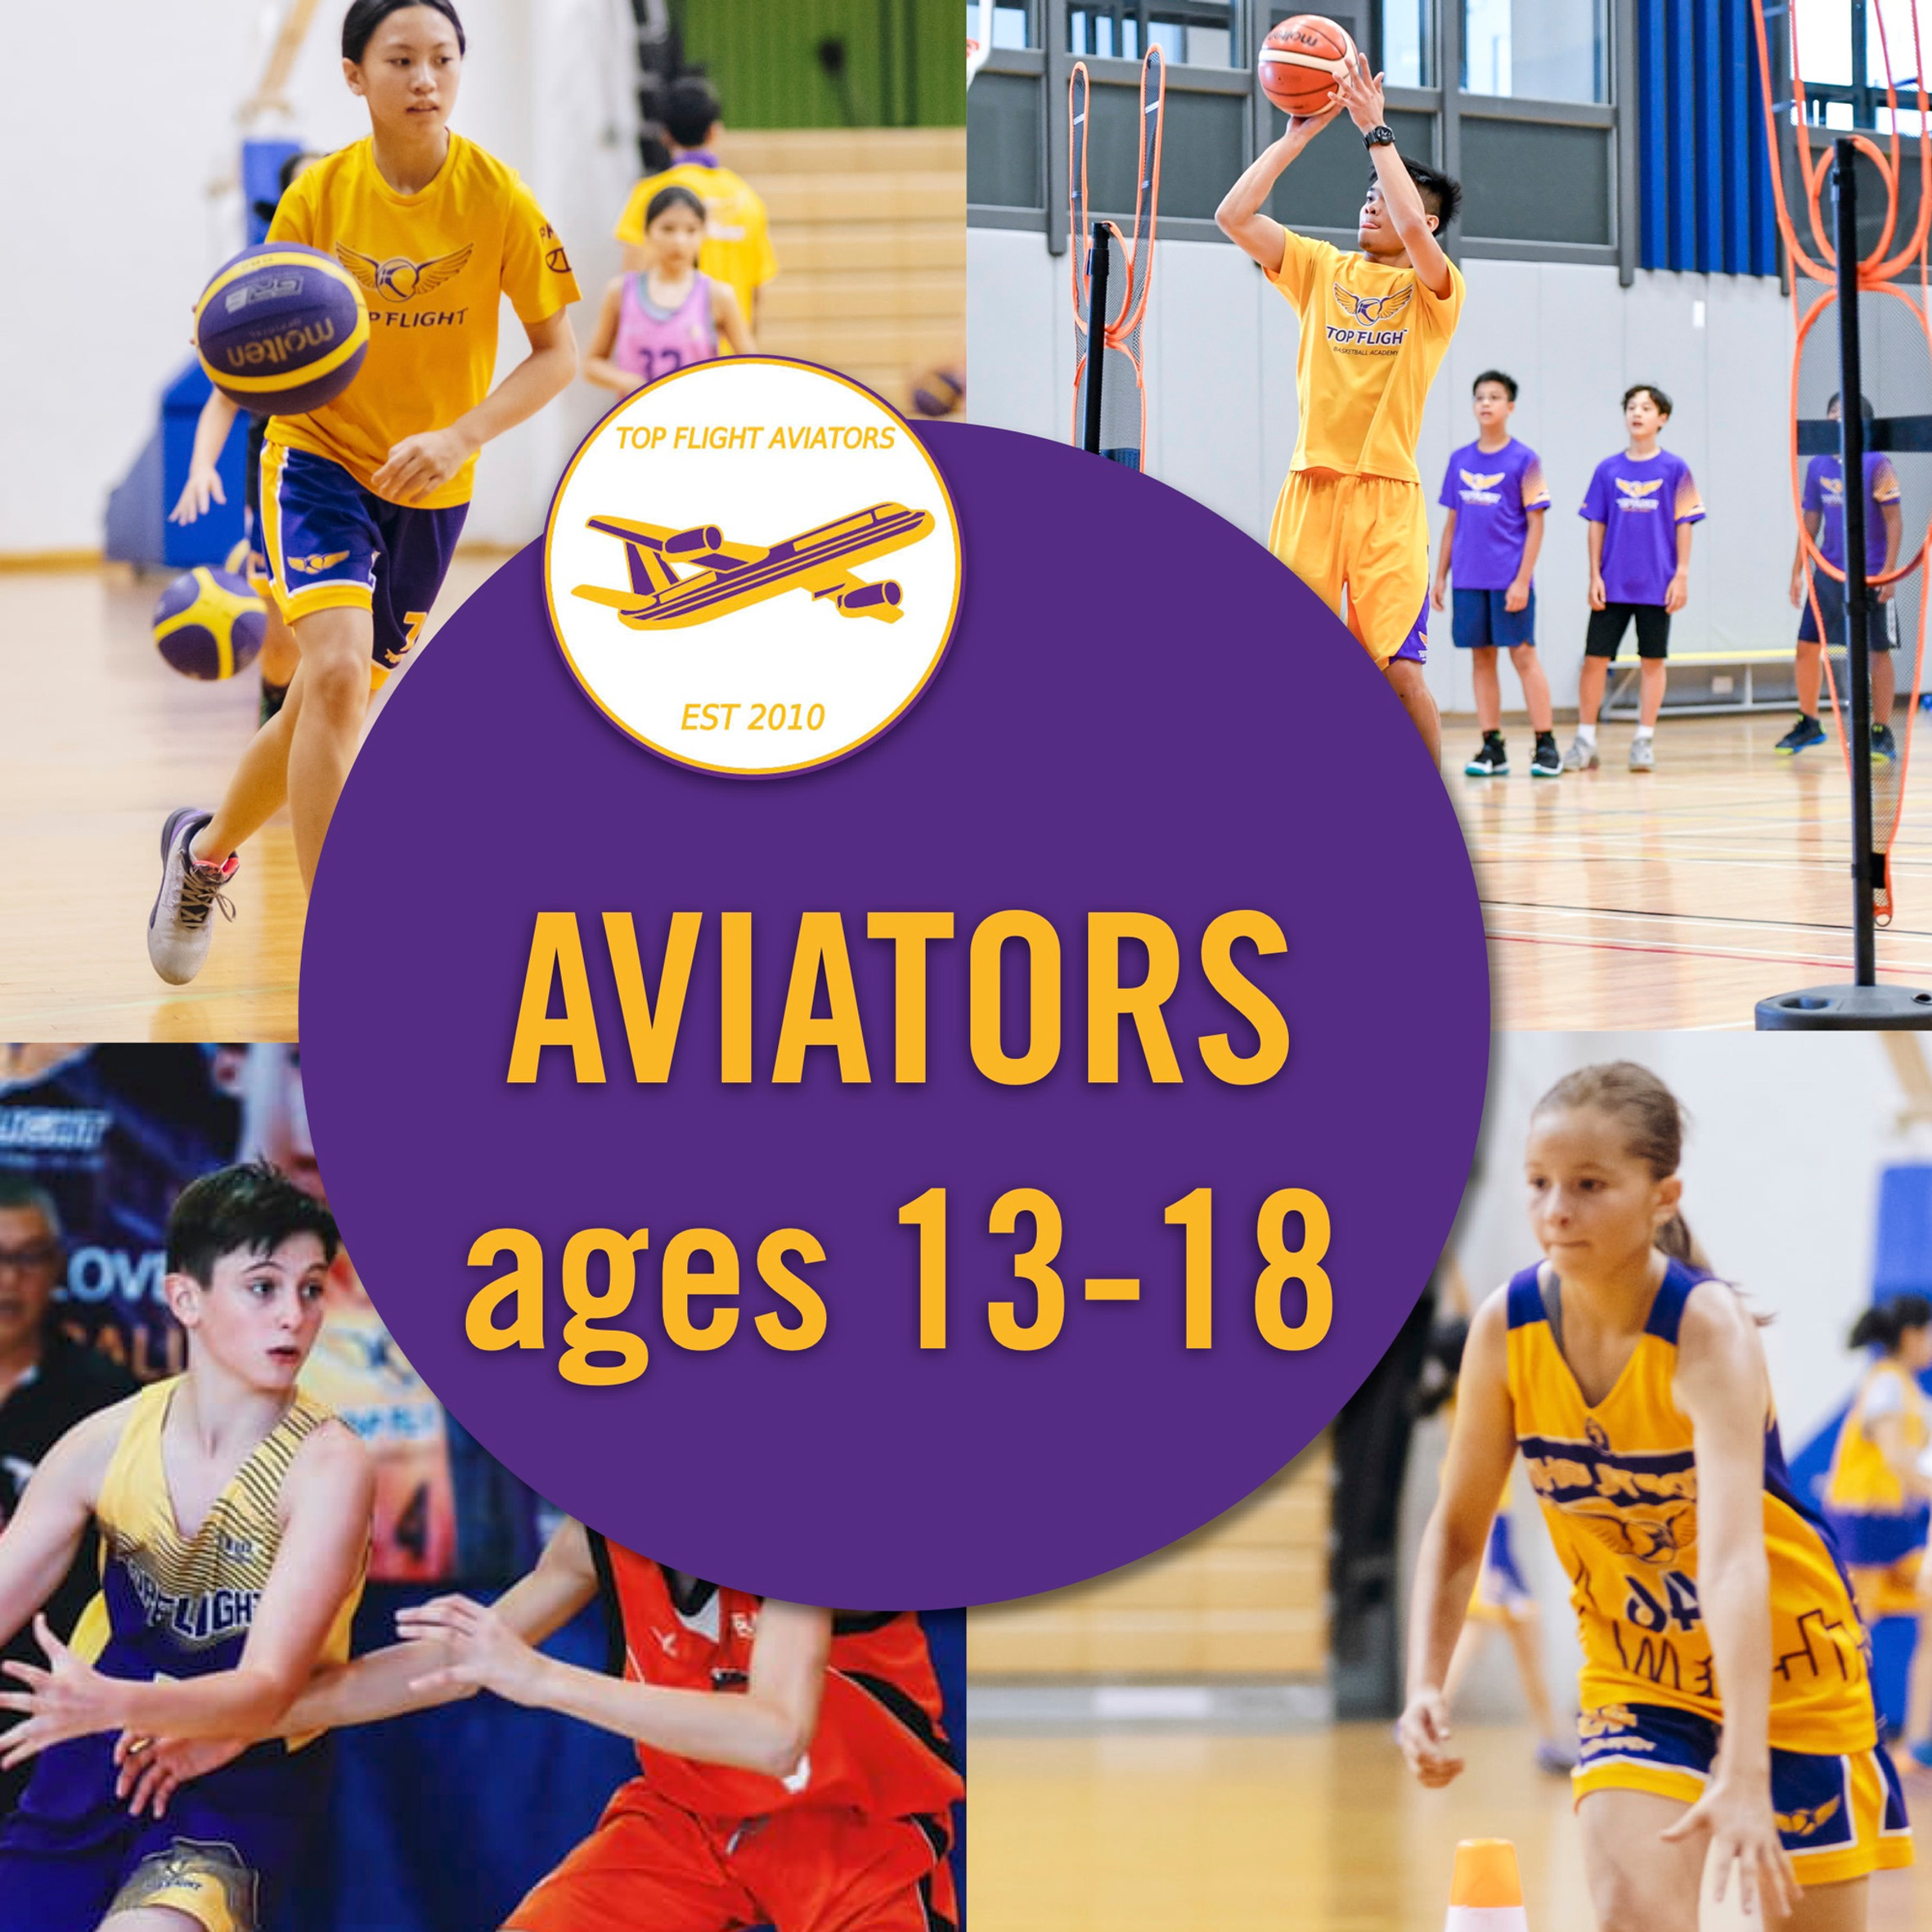 Aviators ages 13-17/09:00-10:30